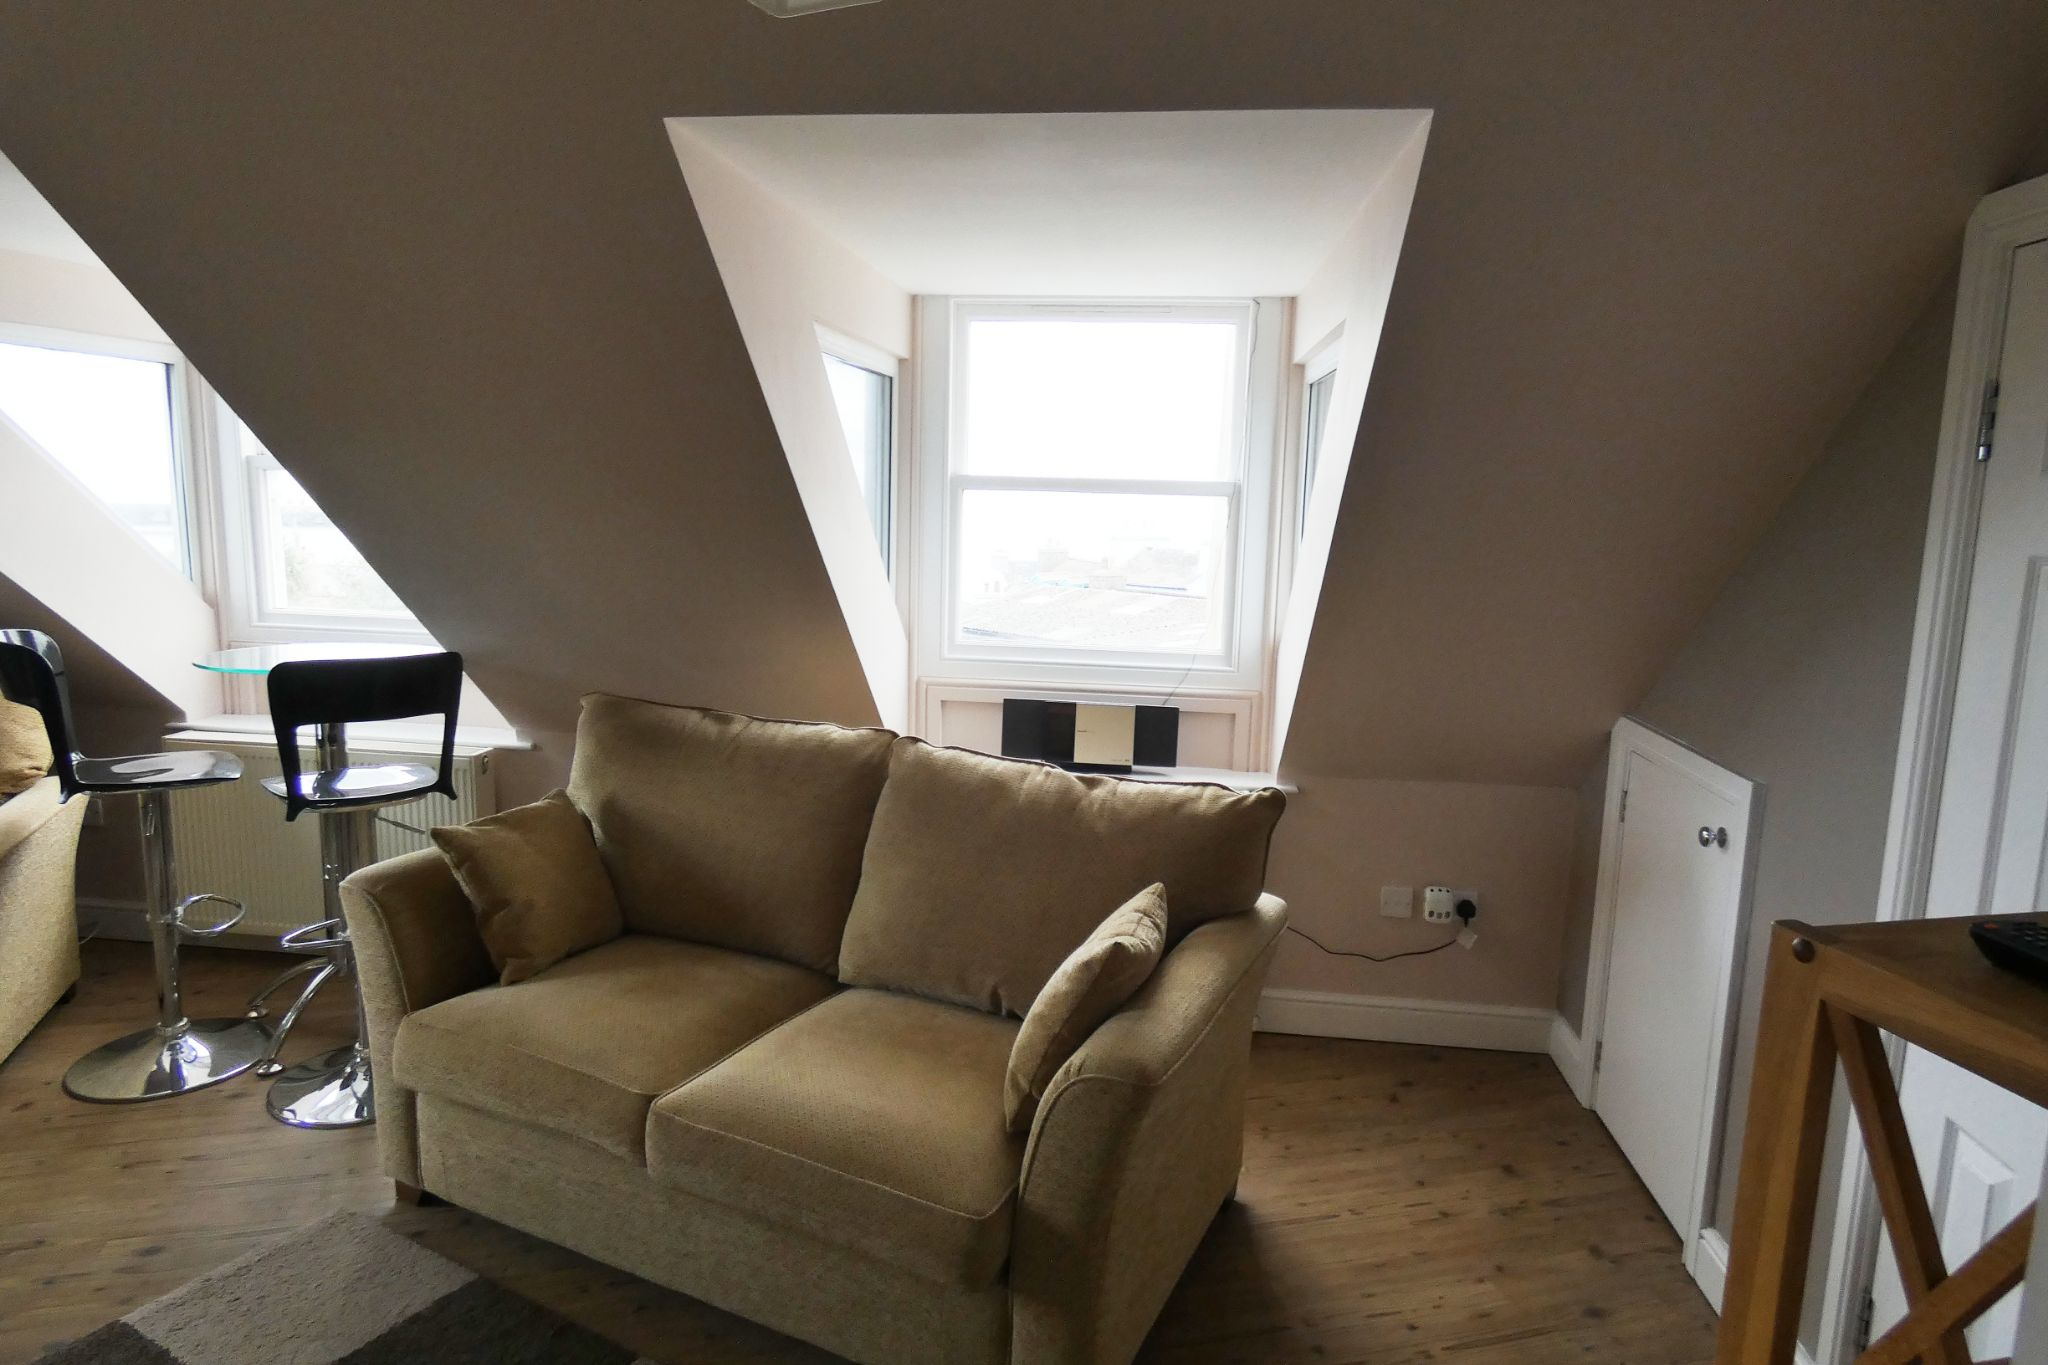 1 bedroom apartment flat/apartment SSTC in Peel - Photograph 6